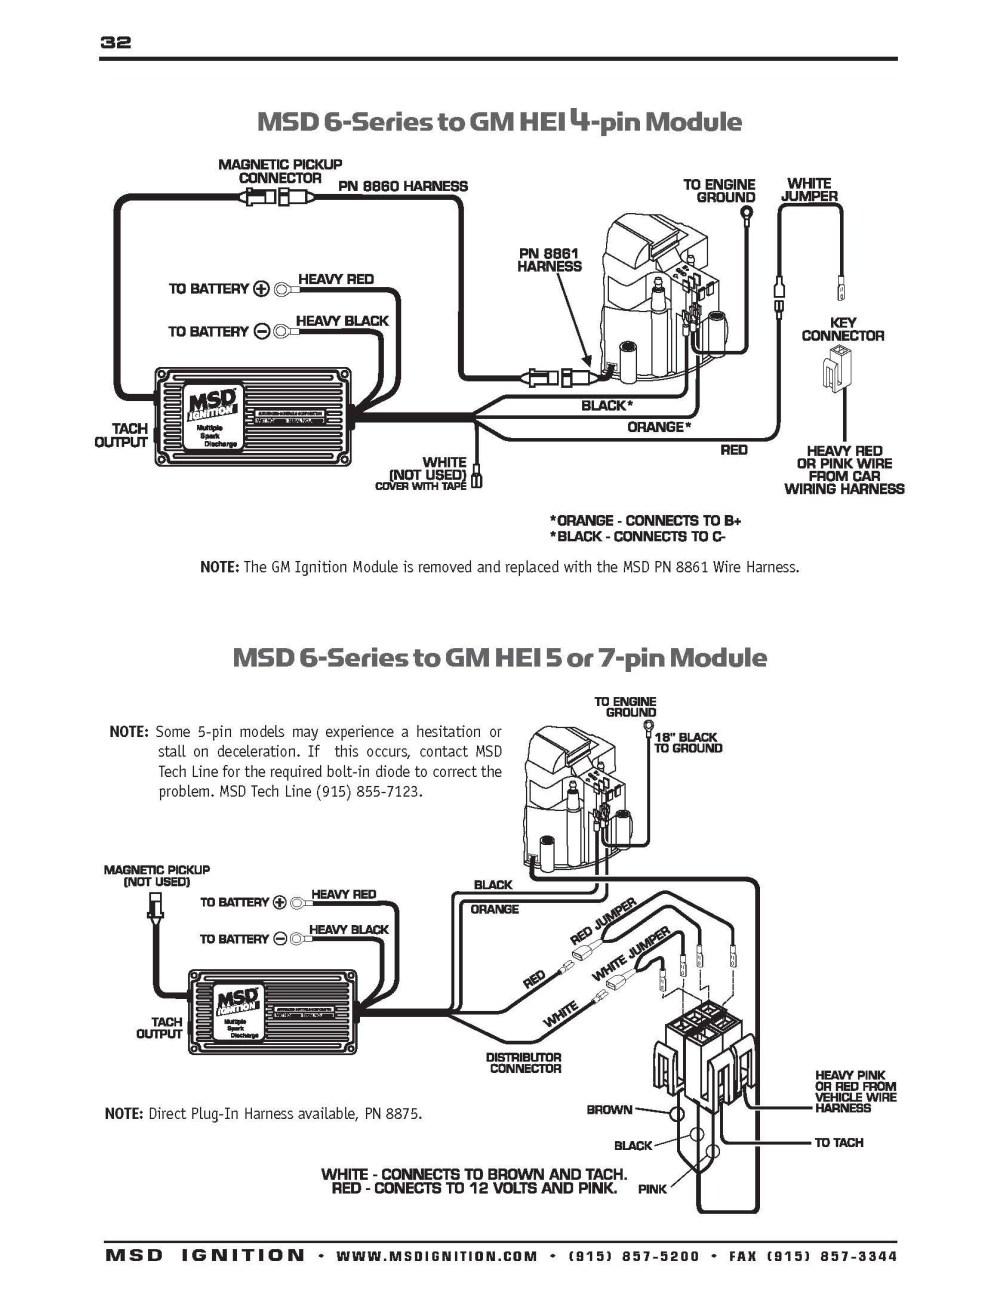 medium resolution of mallory tach wiring diagram wiring diagrammallory tach wiring diagram wiring diagrammallory tach wiring diagram online wiring